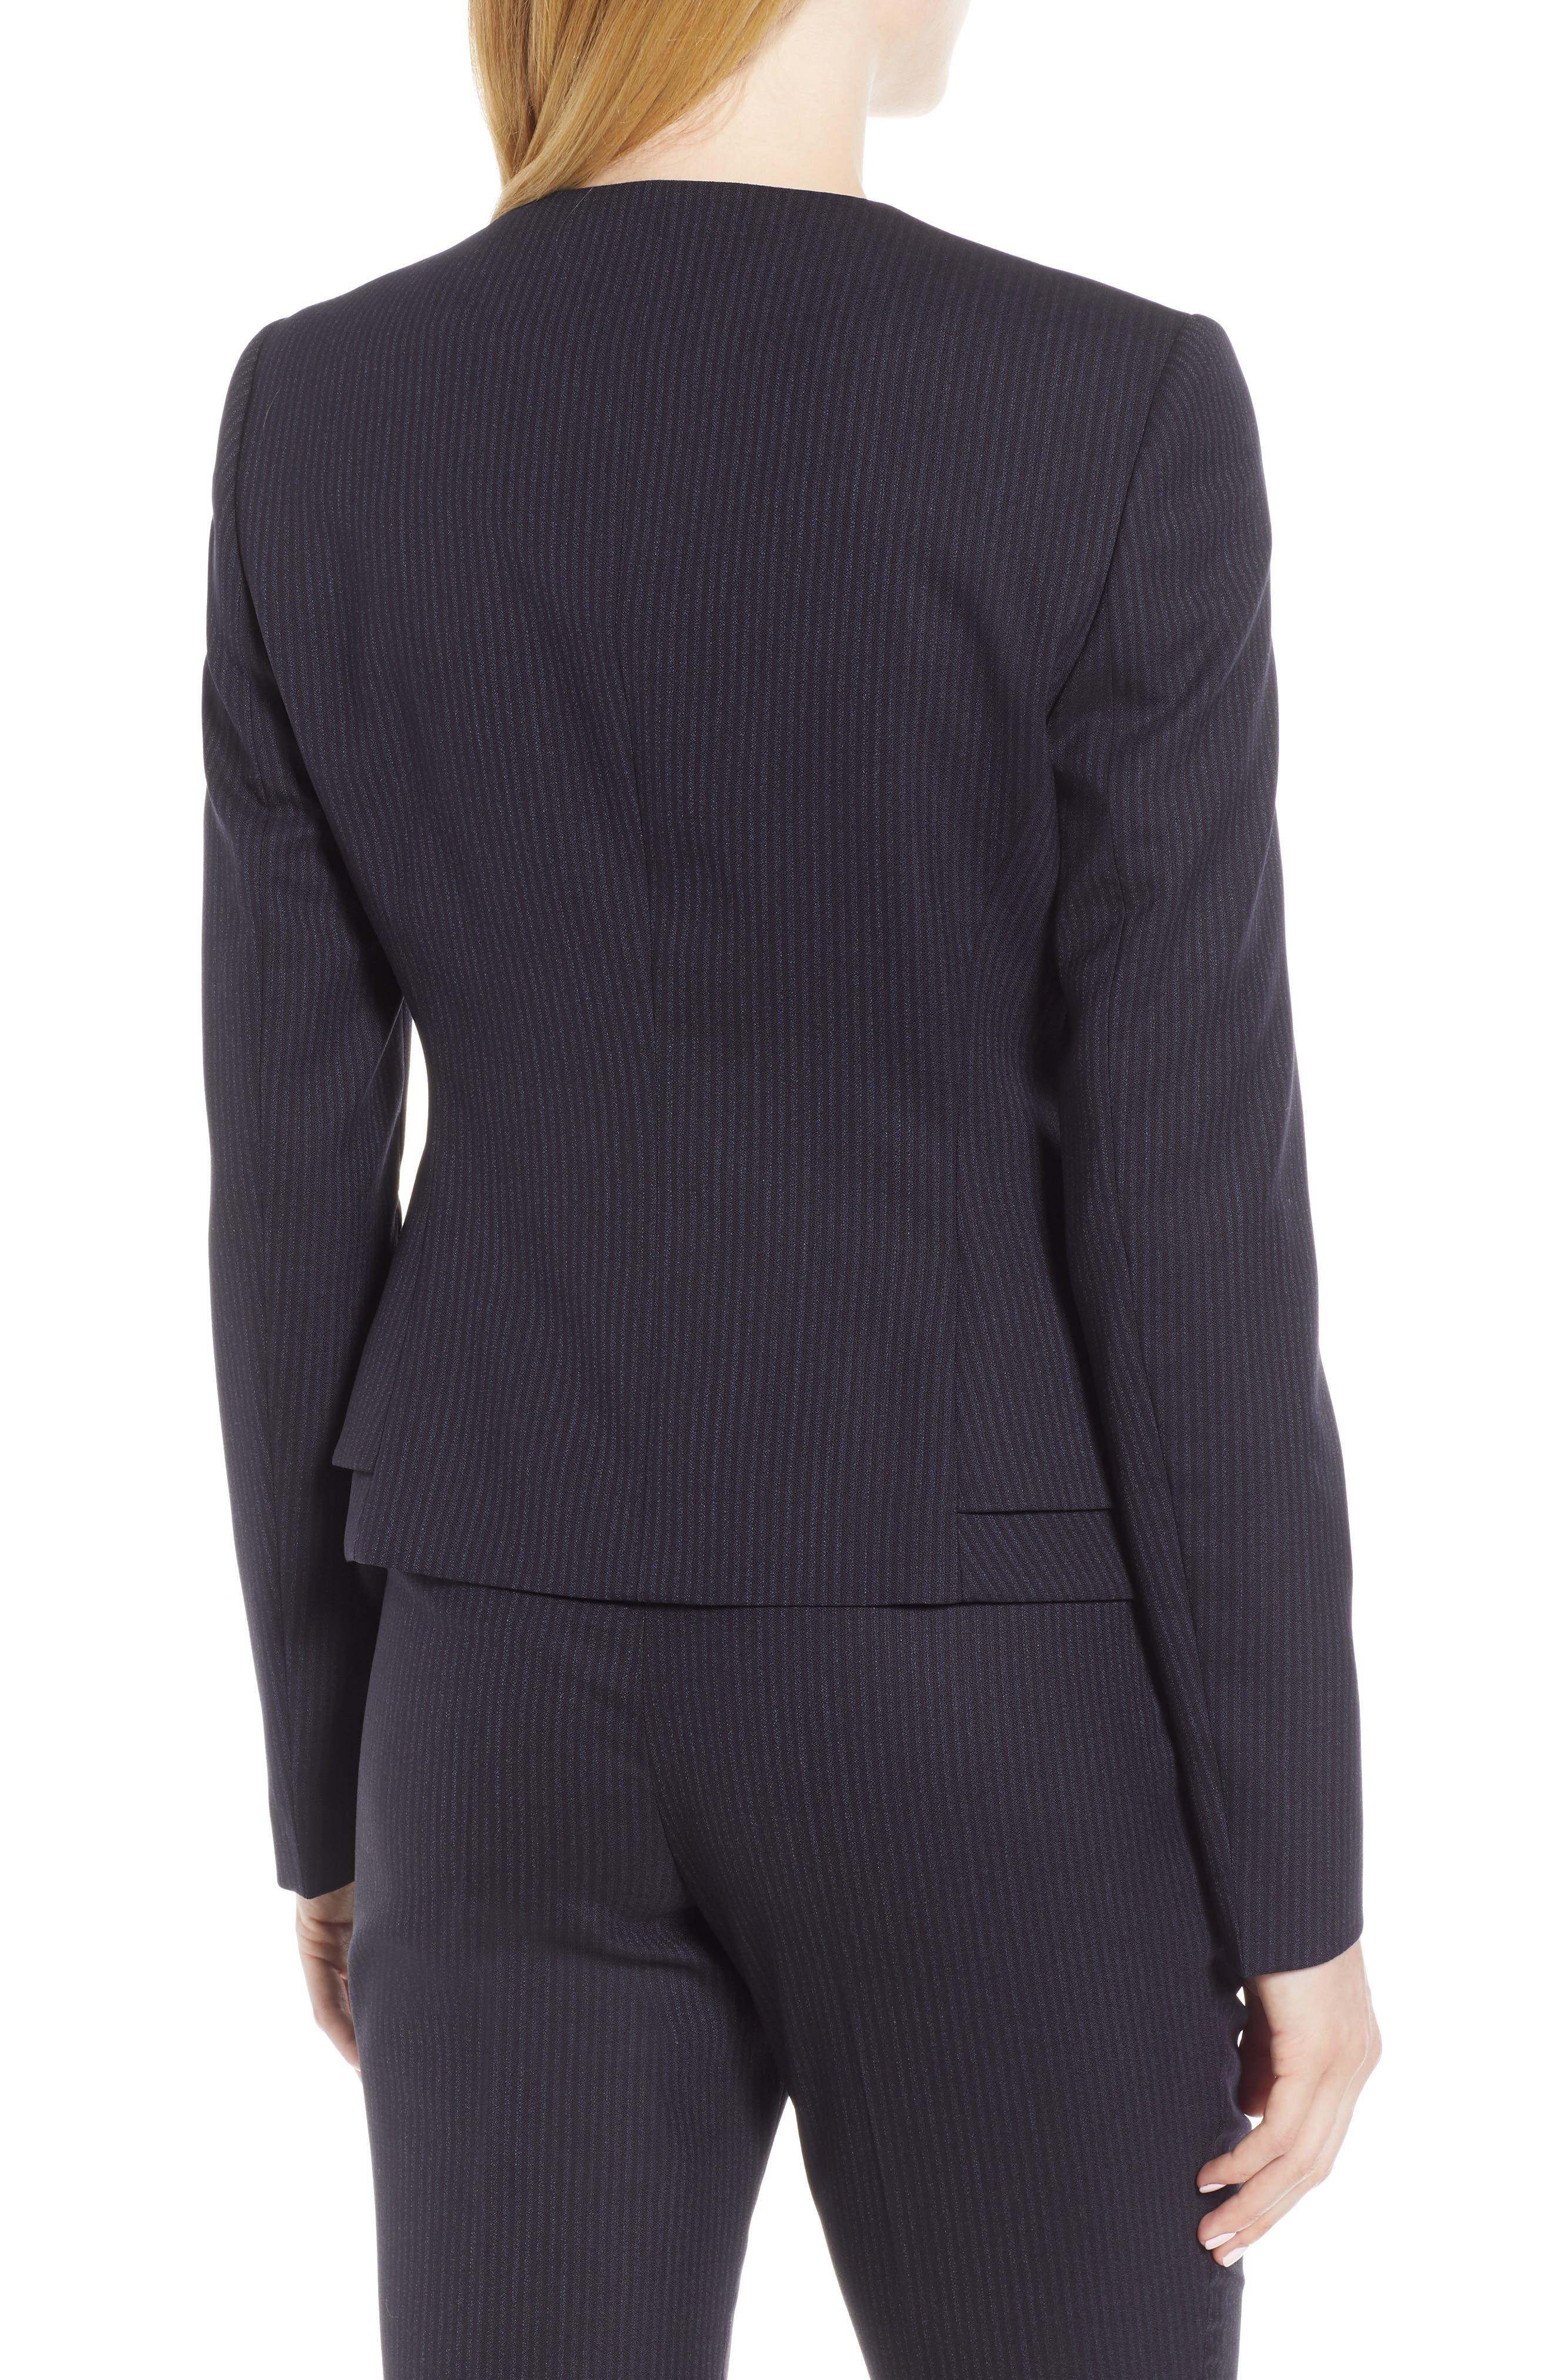 Jasyma Tonal Stripe Stretch Wool Suit Jacket,                             Alternate thumbnail 2, color,                             NAVY FANTASY